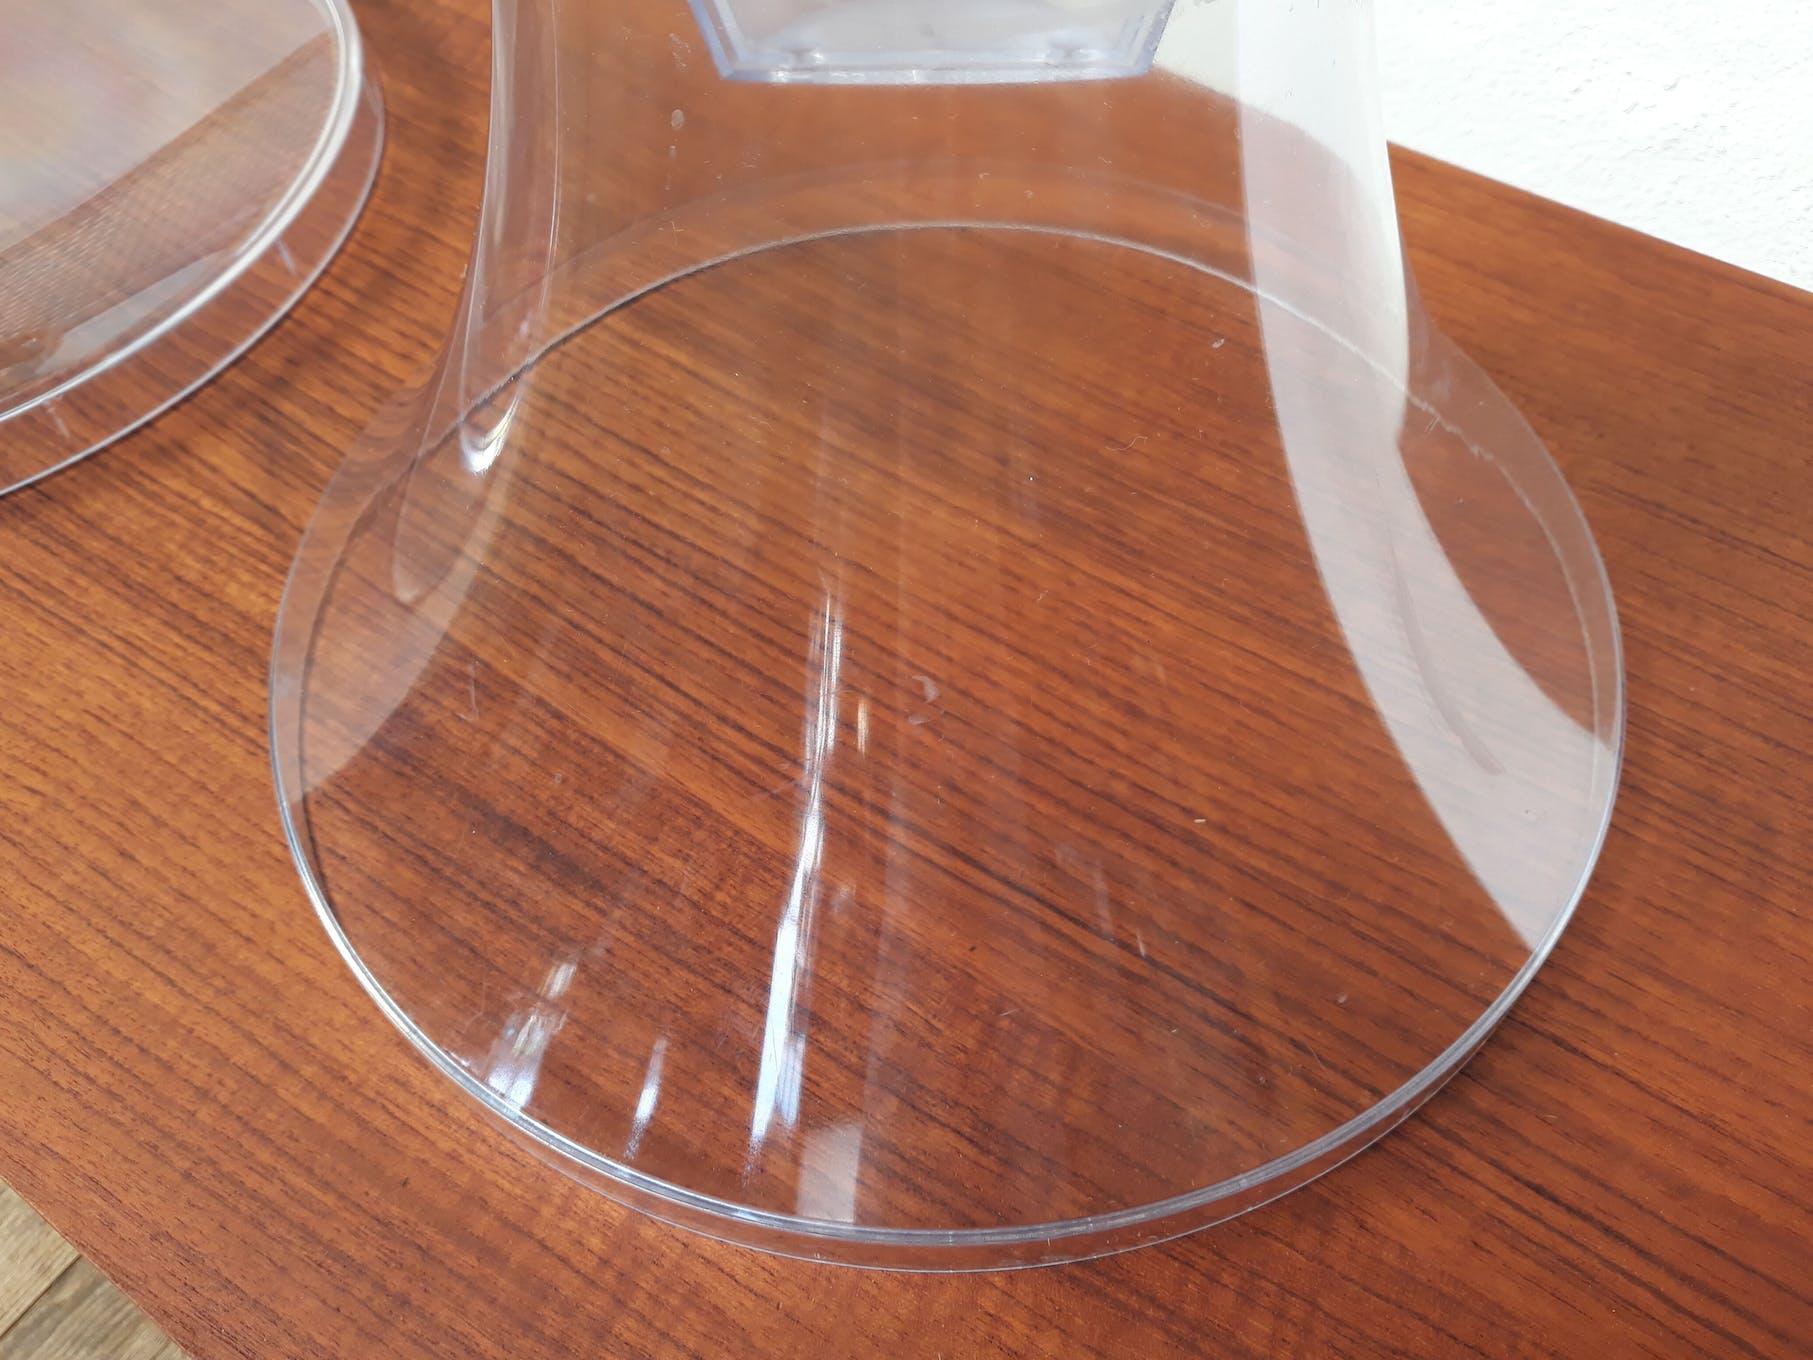 Tabouret Tam Tam Original vintage stool tam tam signed henry massonet   selency